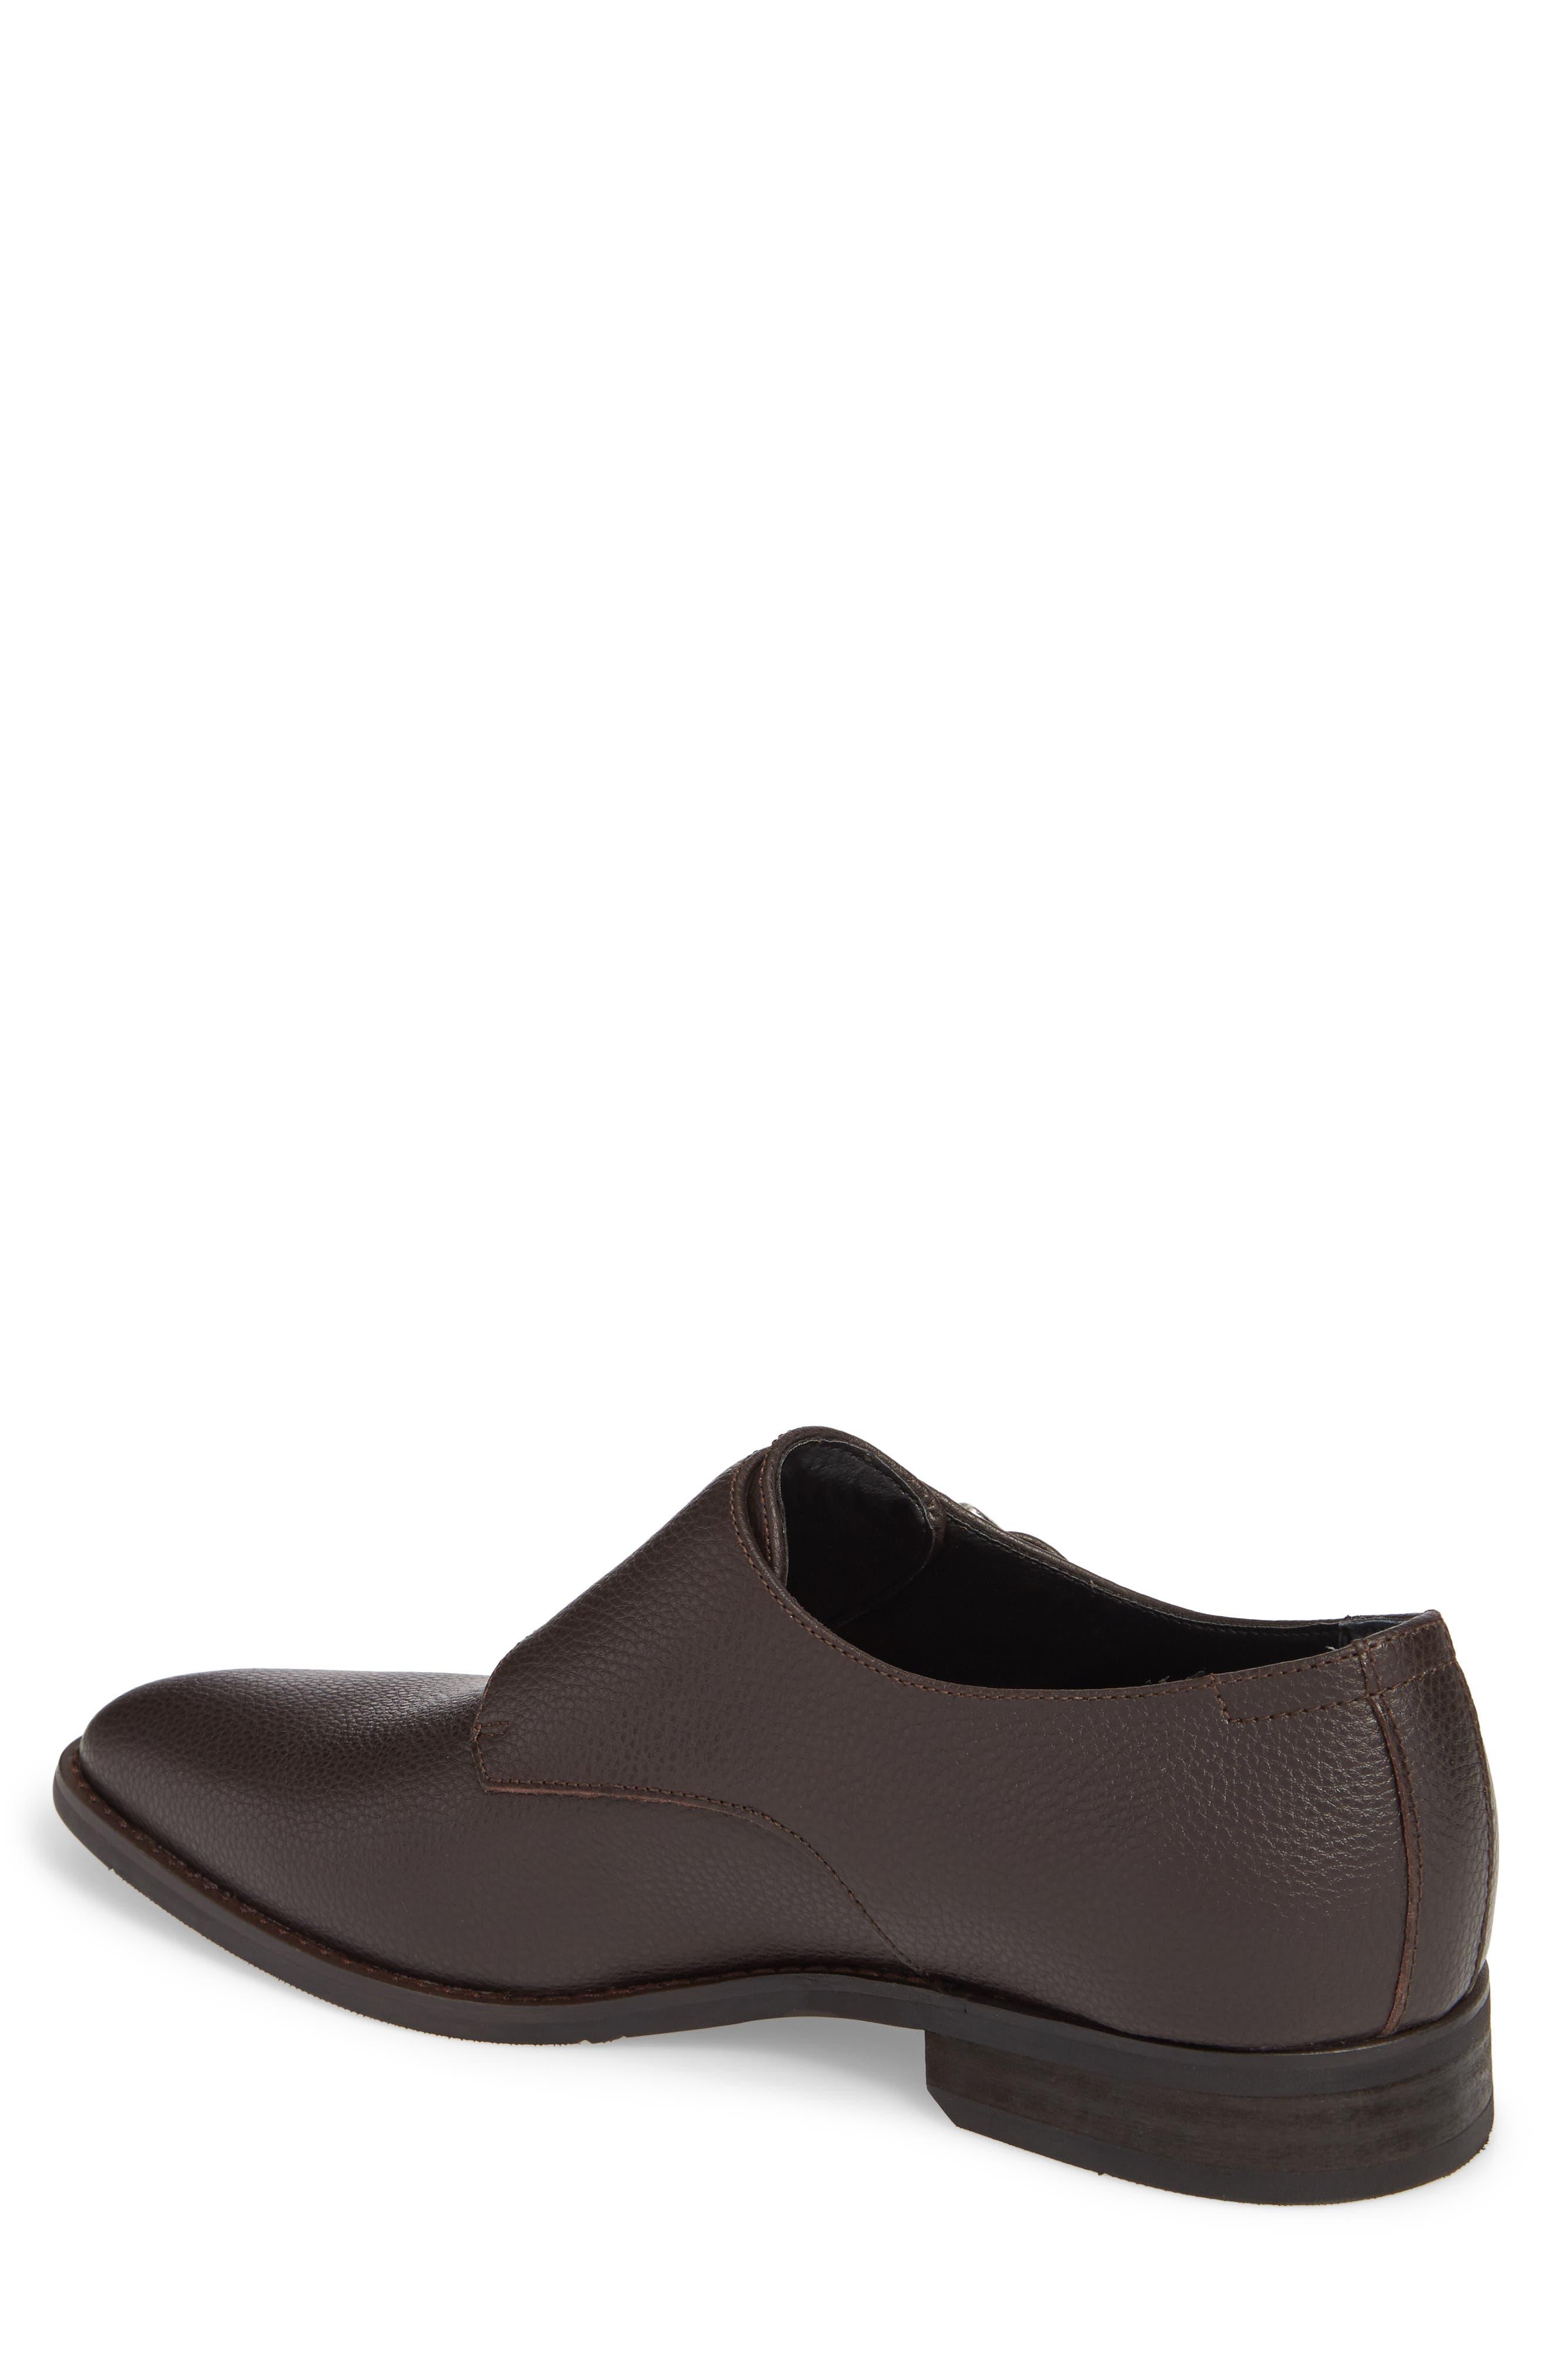 Robbie Double Monk Strap Shoe,                             Alternate thumbnail 2, color,                             Dark Brown Leather